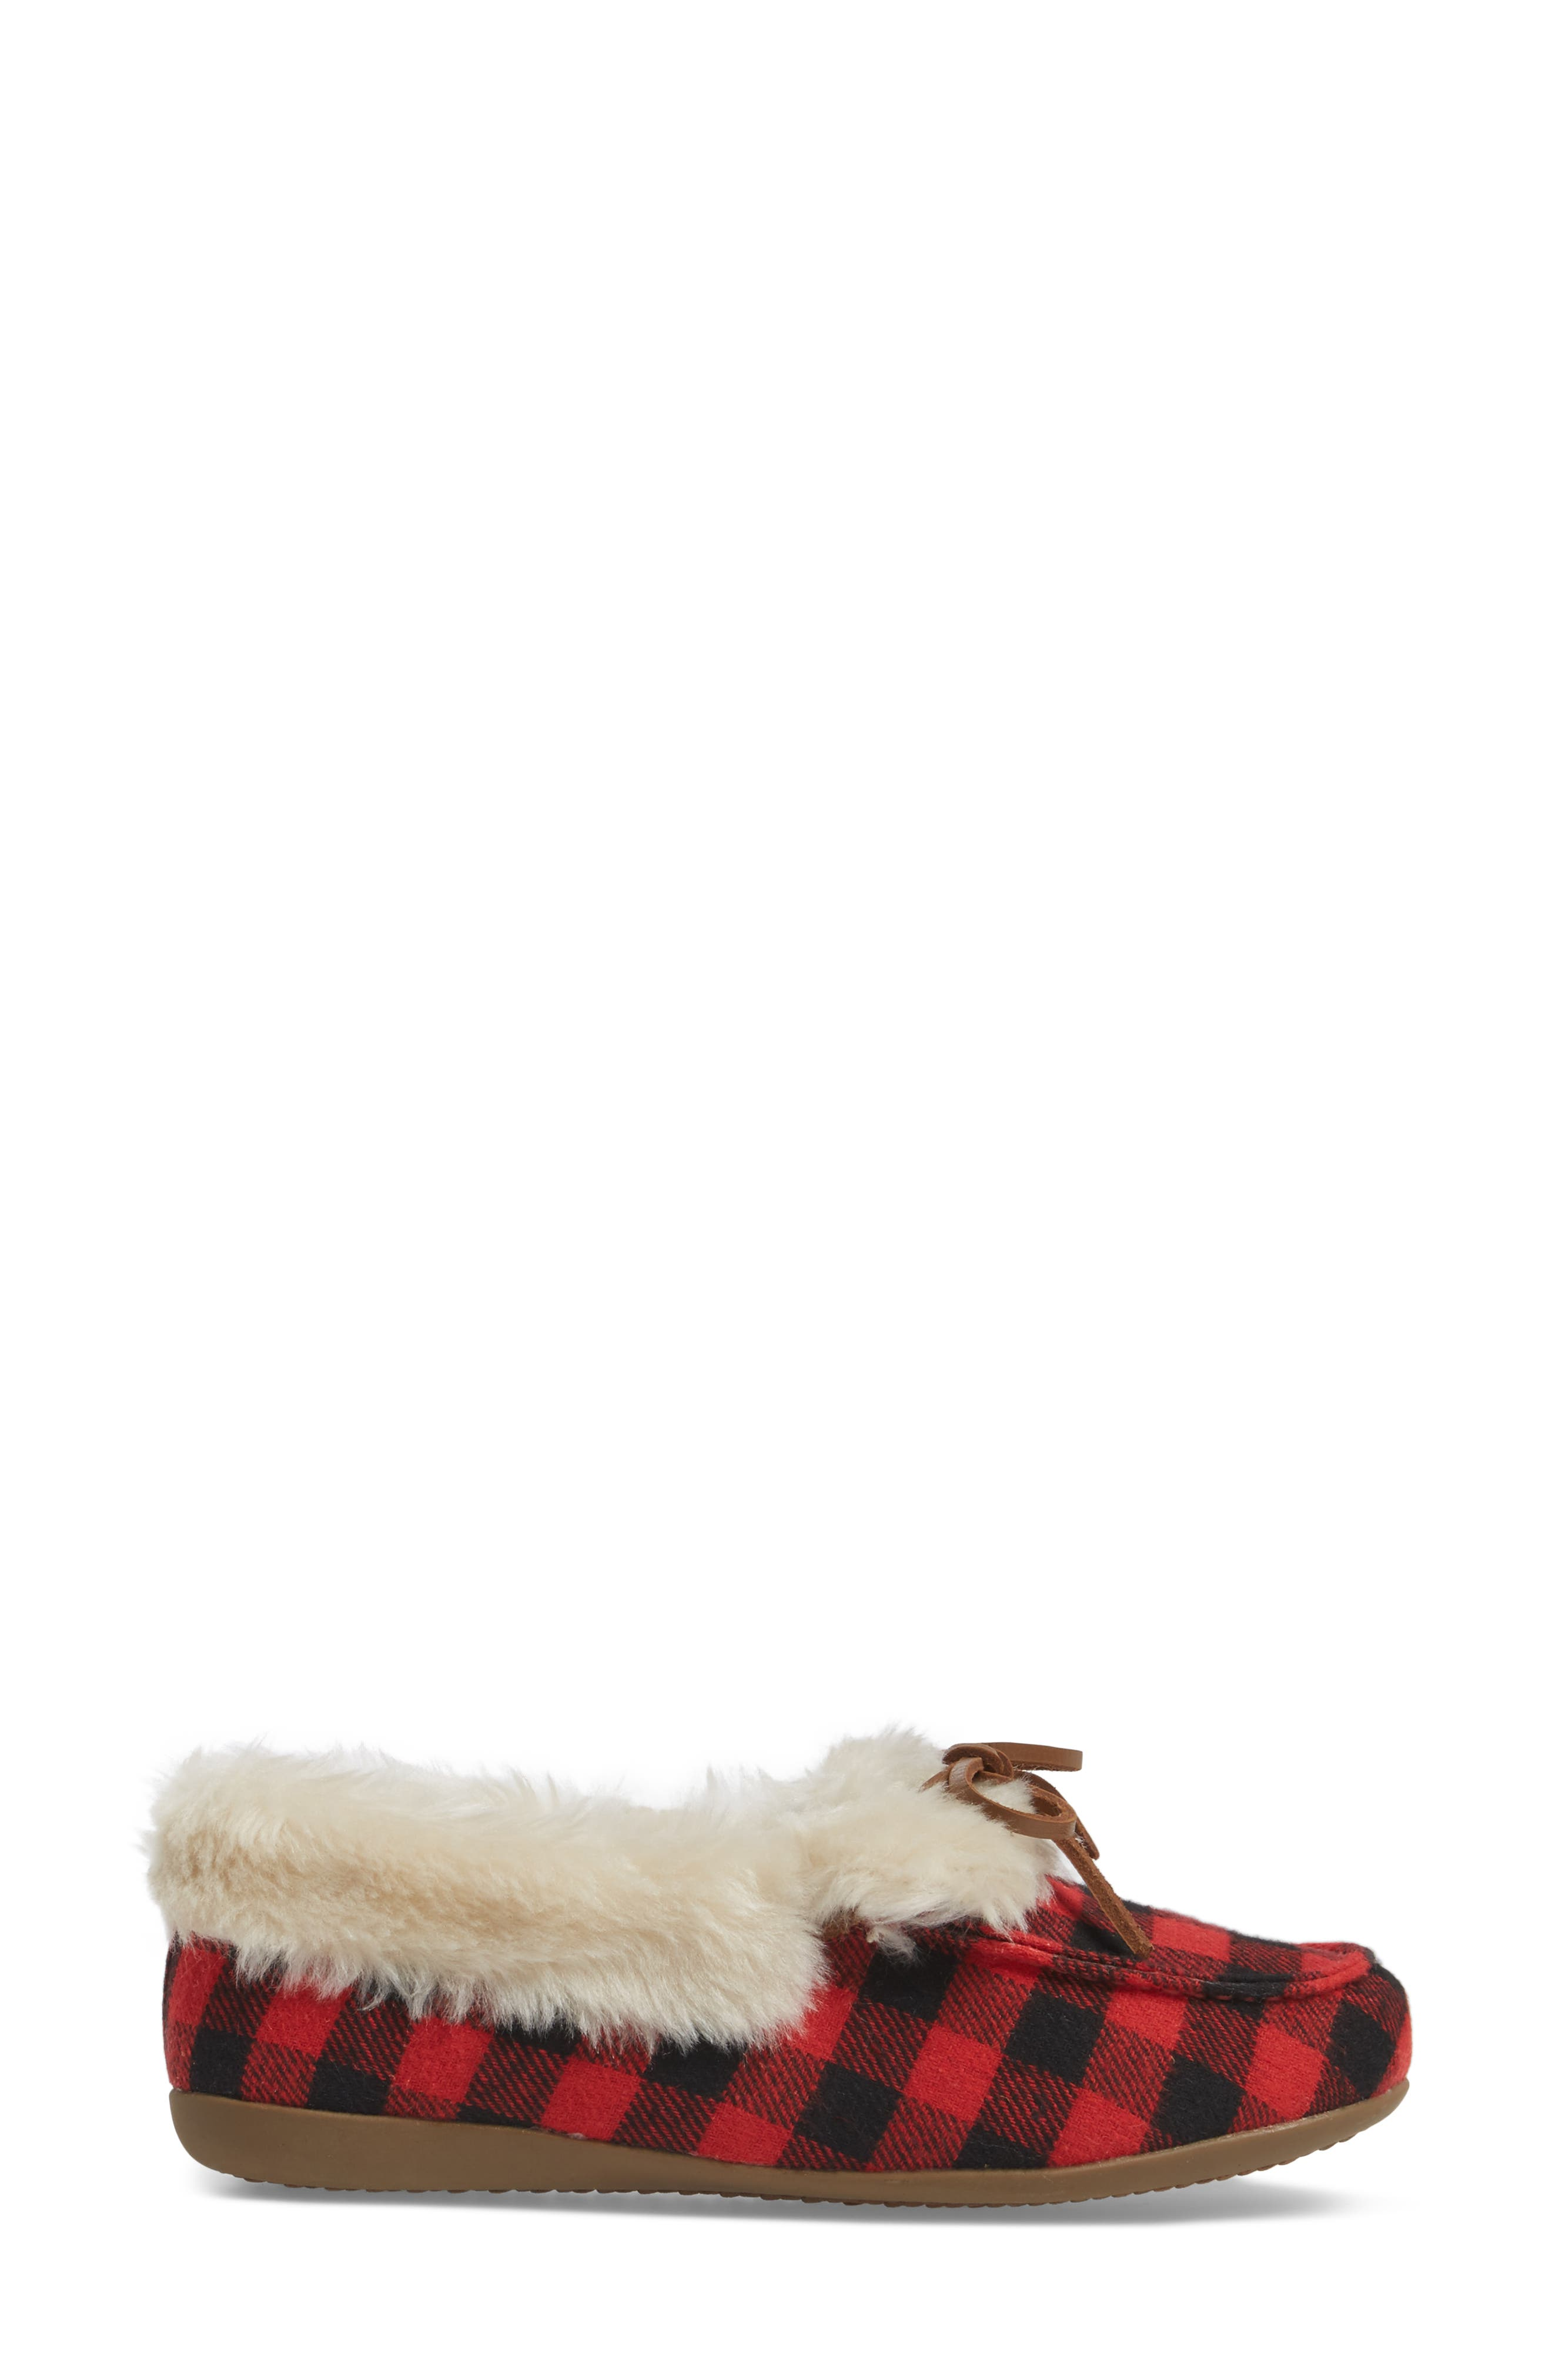 Juniper Faux Fur Slipper,                             Alternate thumbnail 11, color,